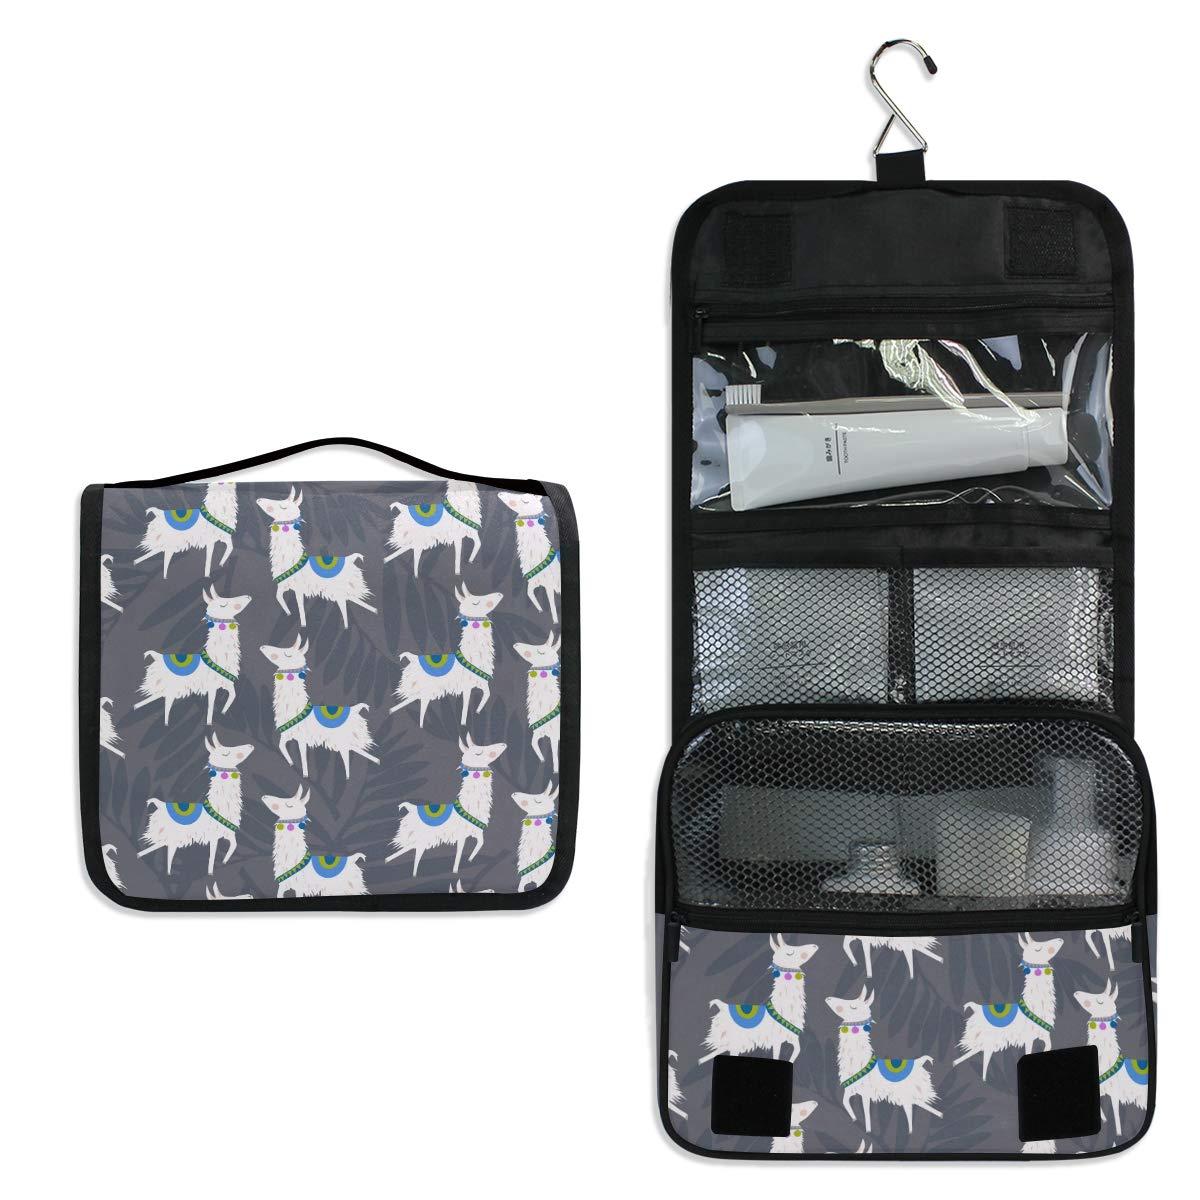 Llamas Toiletry Bag Multifunction Cosmetic Bag Portable Makeup Pouch Travel Hanging Organizer Bag for Women Girls